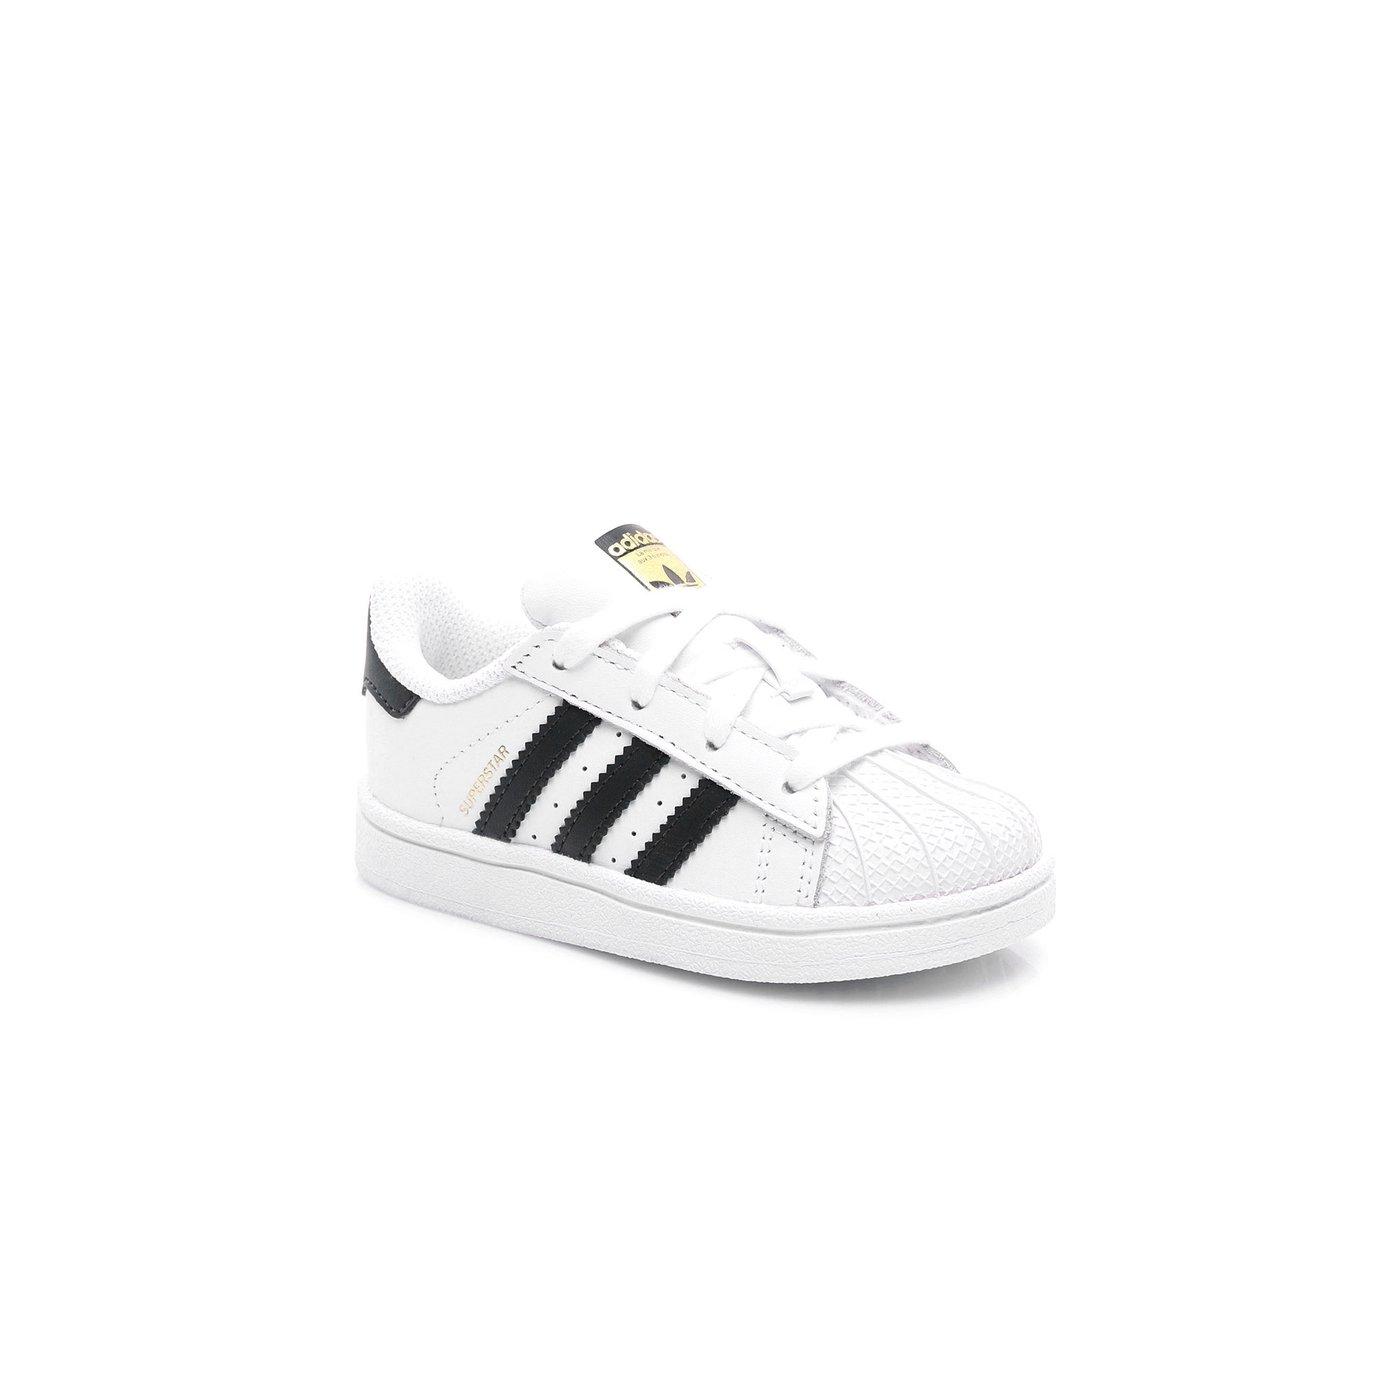 adidas Originals Superstar Çocuk Beyaz Spor Ayakkabı